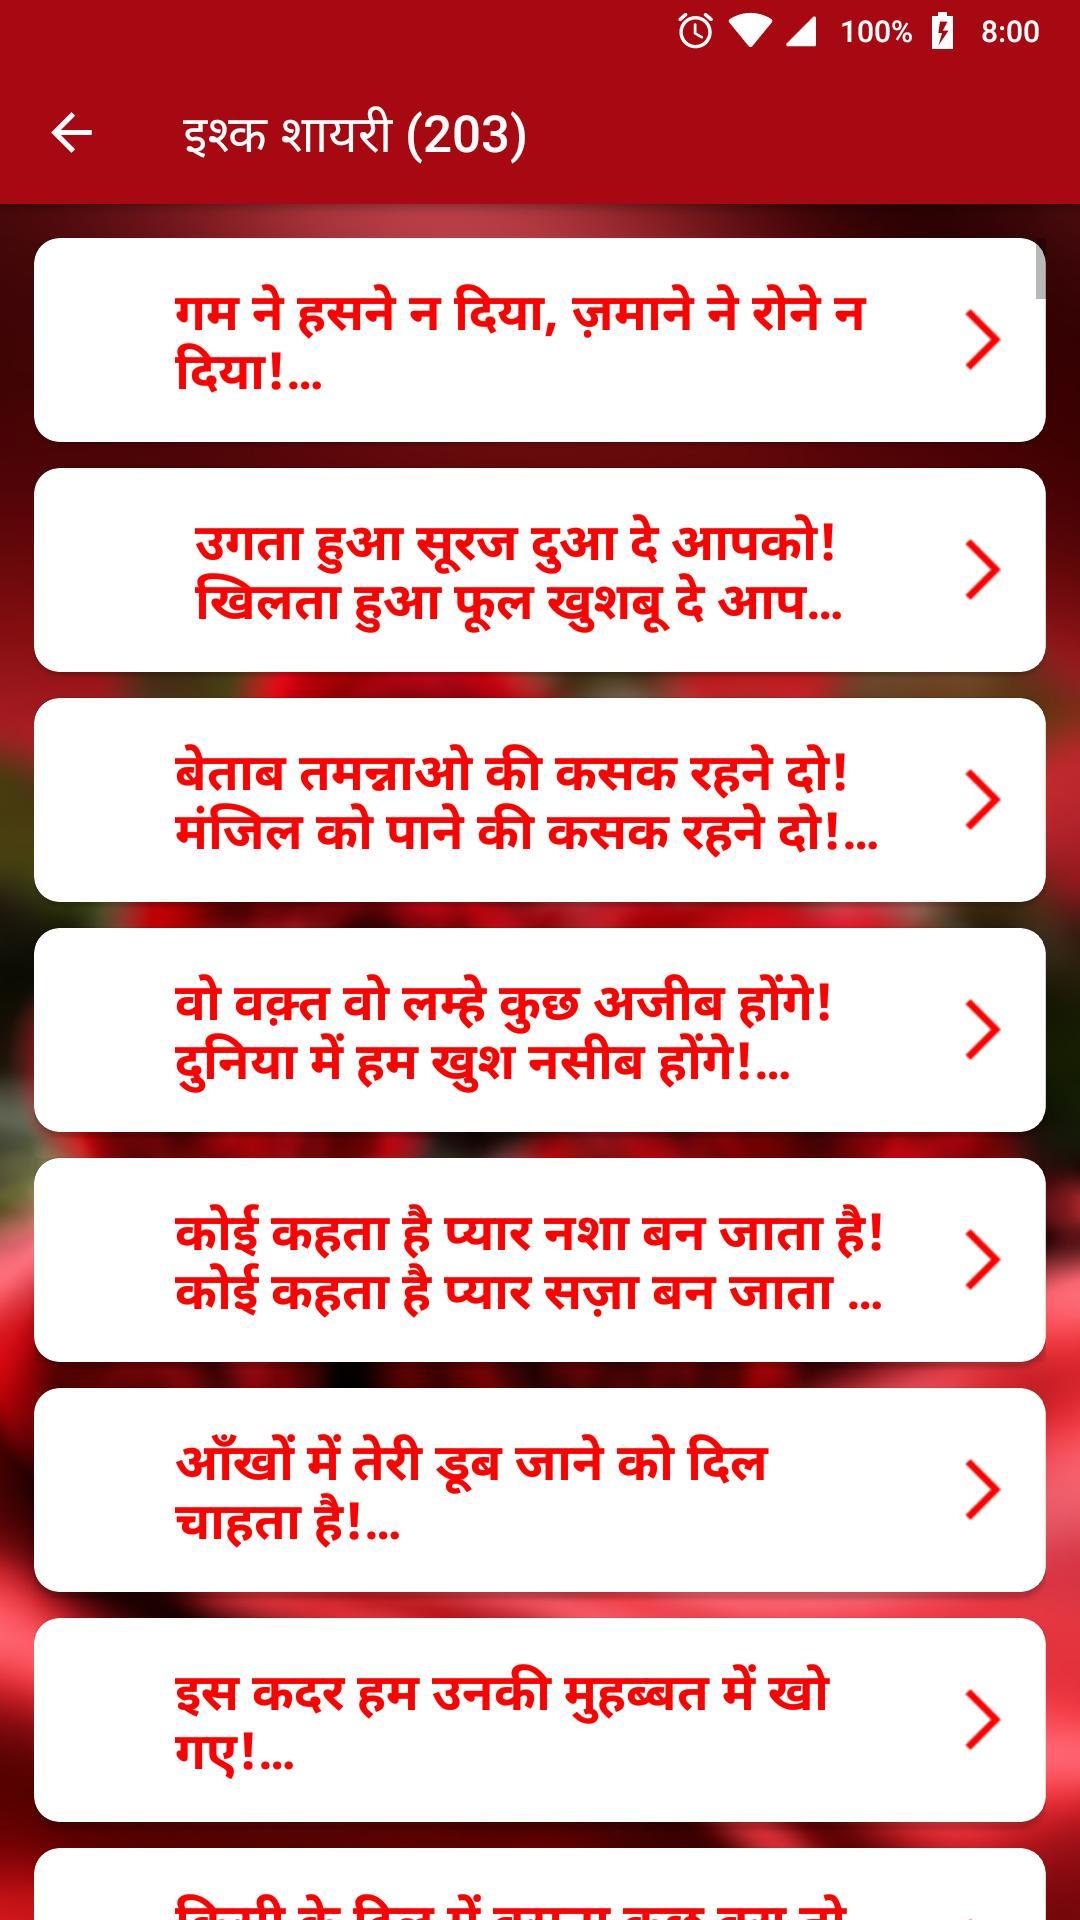 Hindi Shayari, WhatsApp Status & Jokes 2019 for Android ...